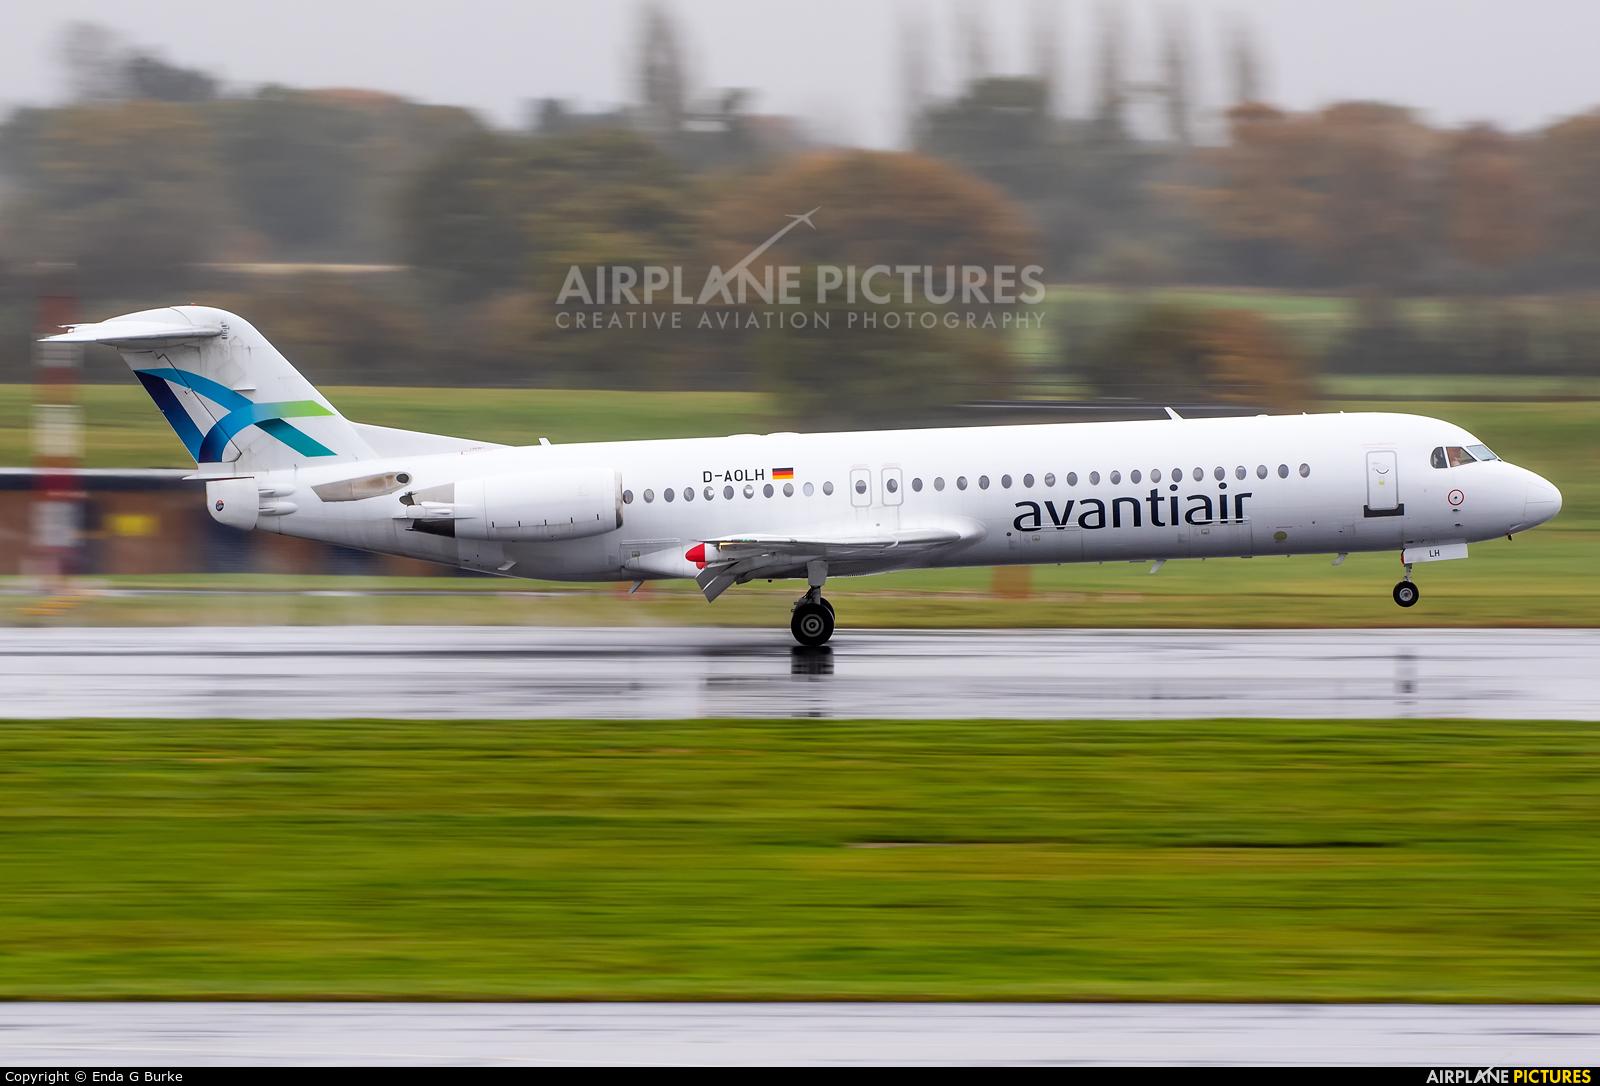 AvantiAir D-AOLH aircraft at Manchester